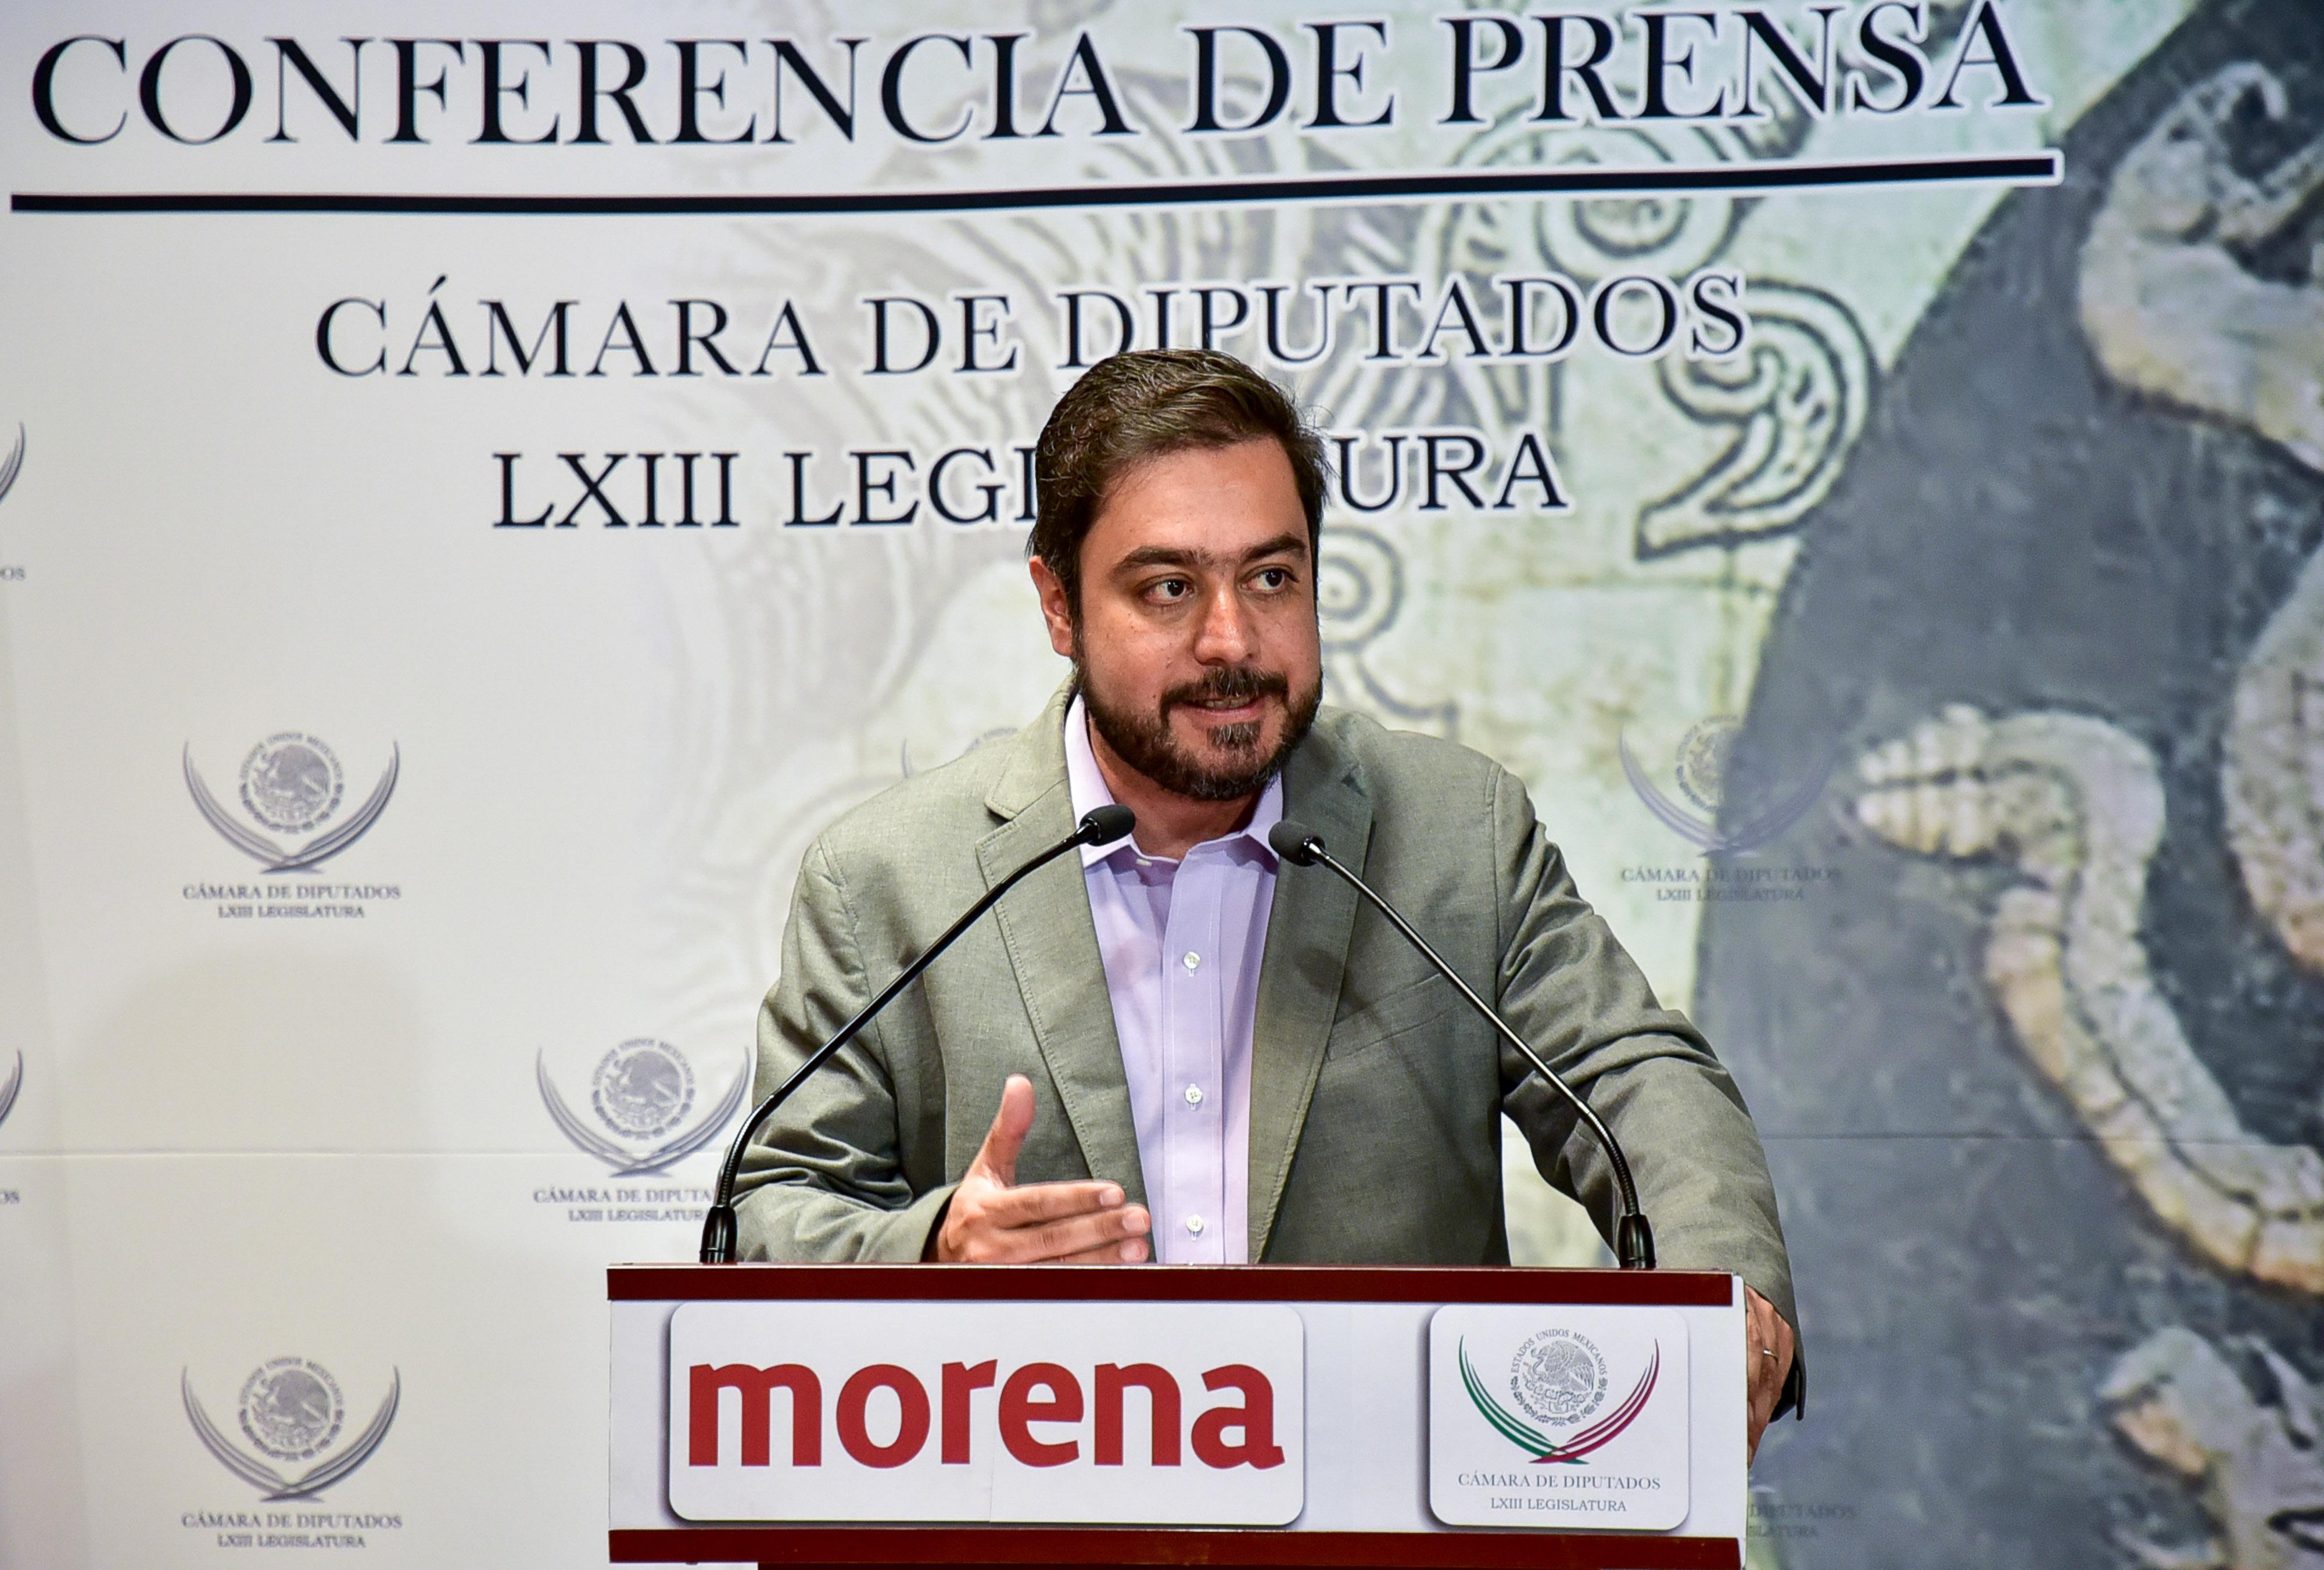 https://paginabierta.mx/wp-content/uploads/2017/08/26dip.jpg